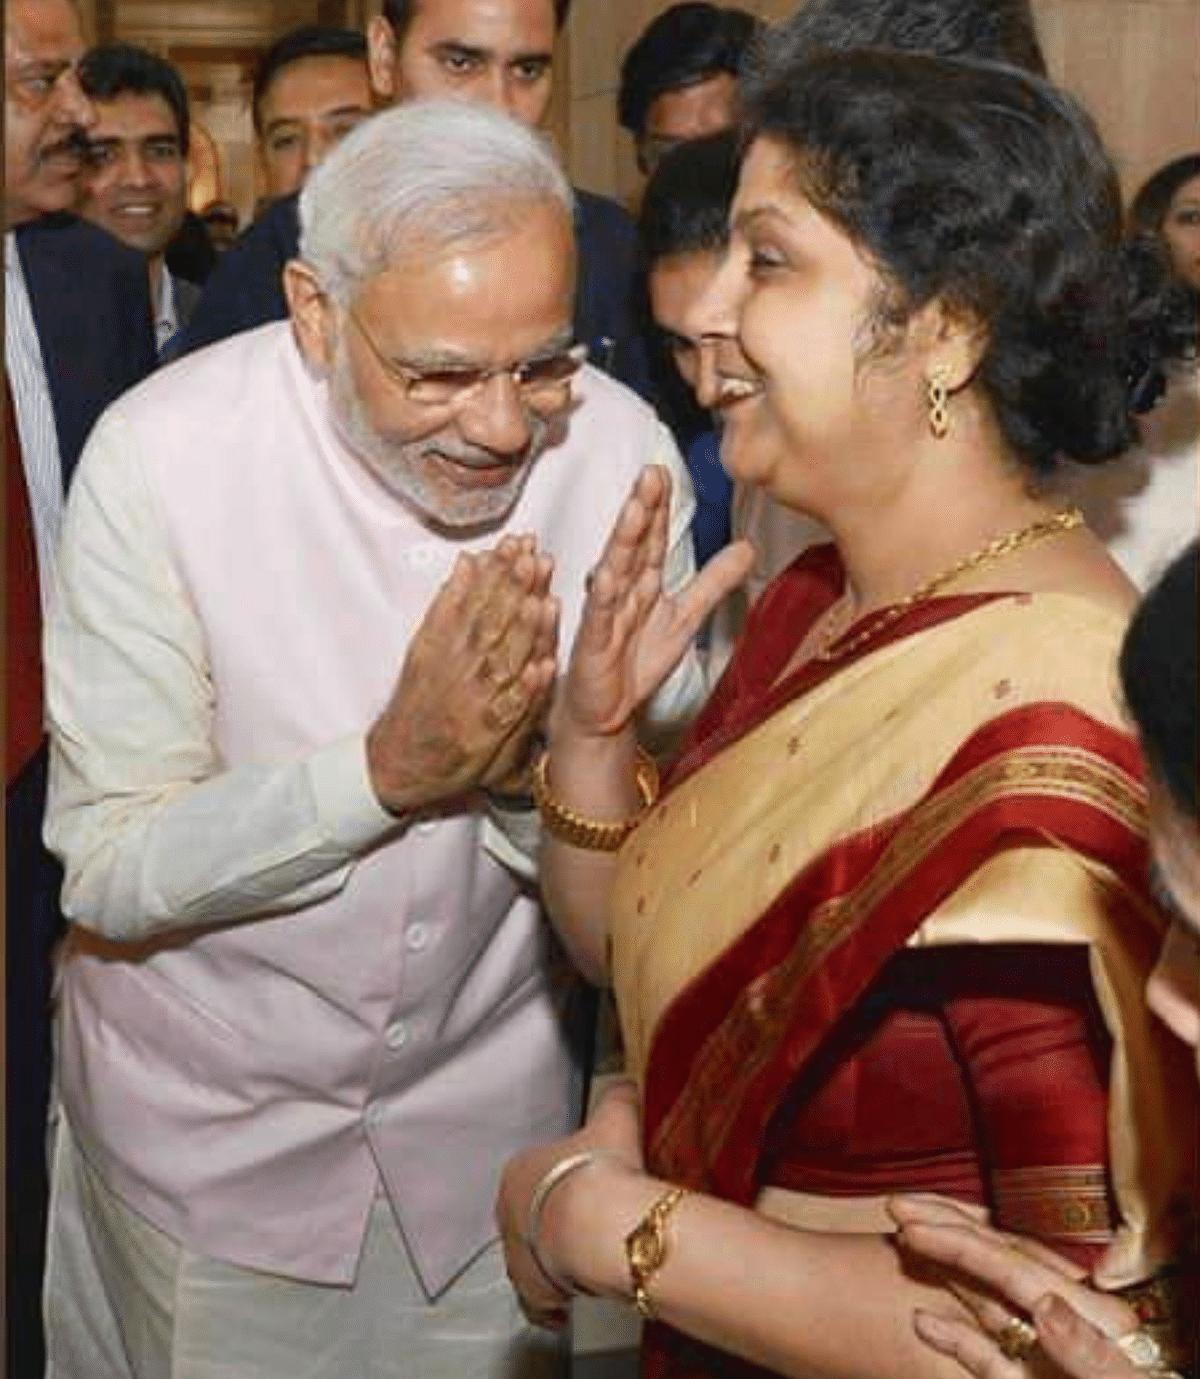 Images of Modi Greeting Women Misidentified As Gautam Adani's Wife